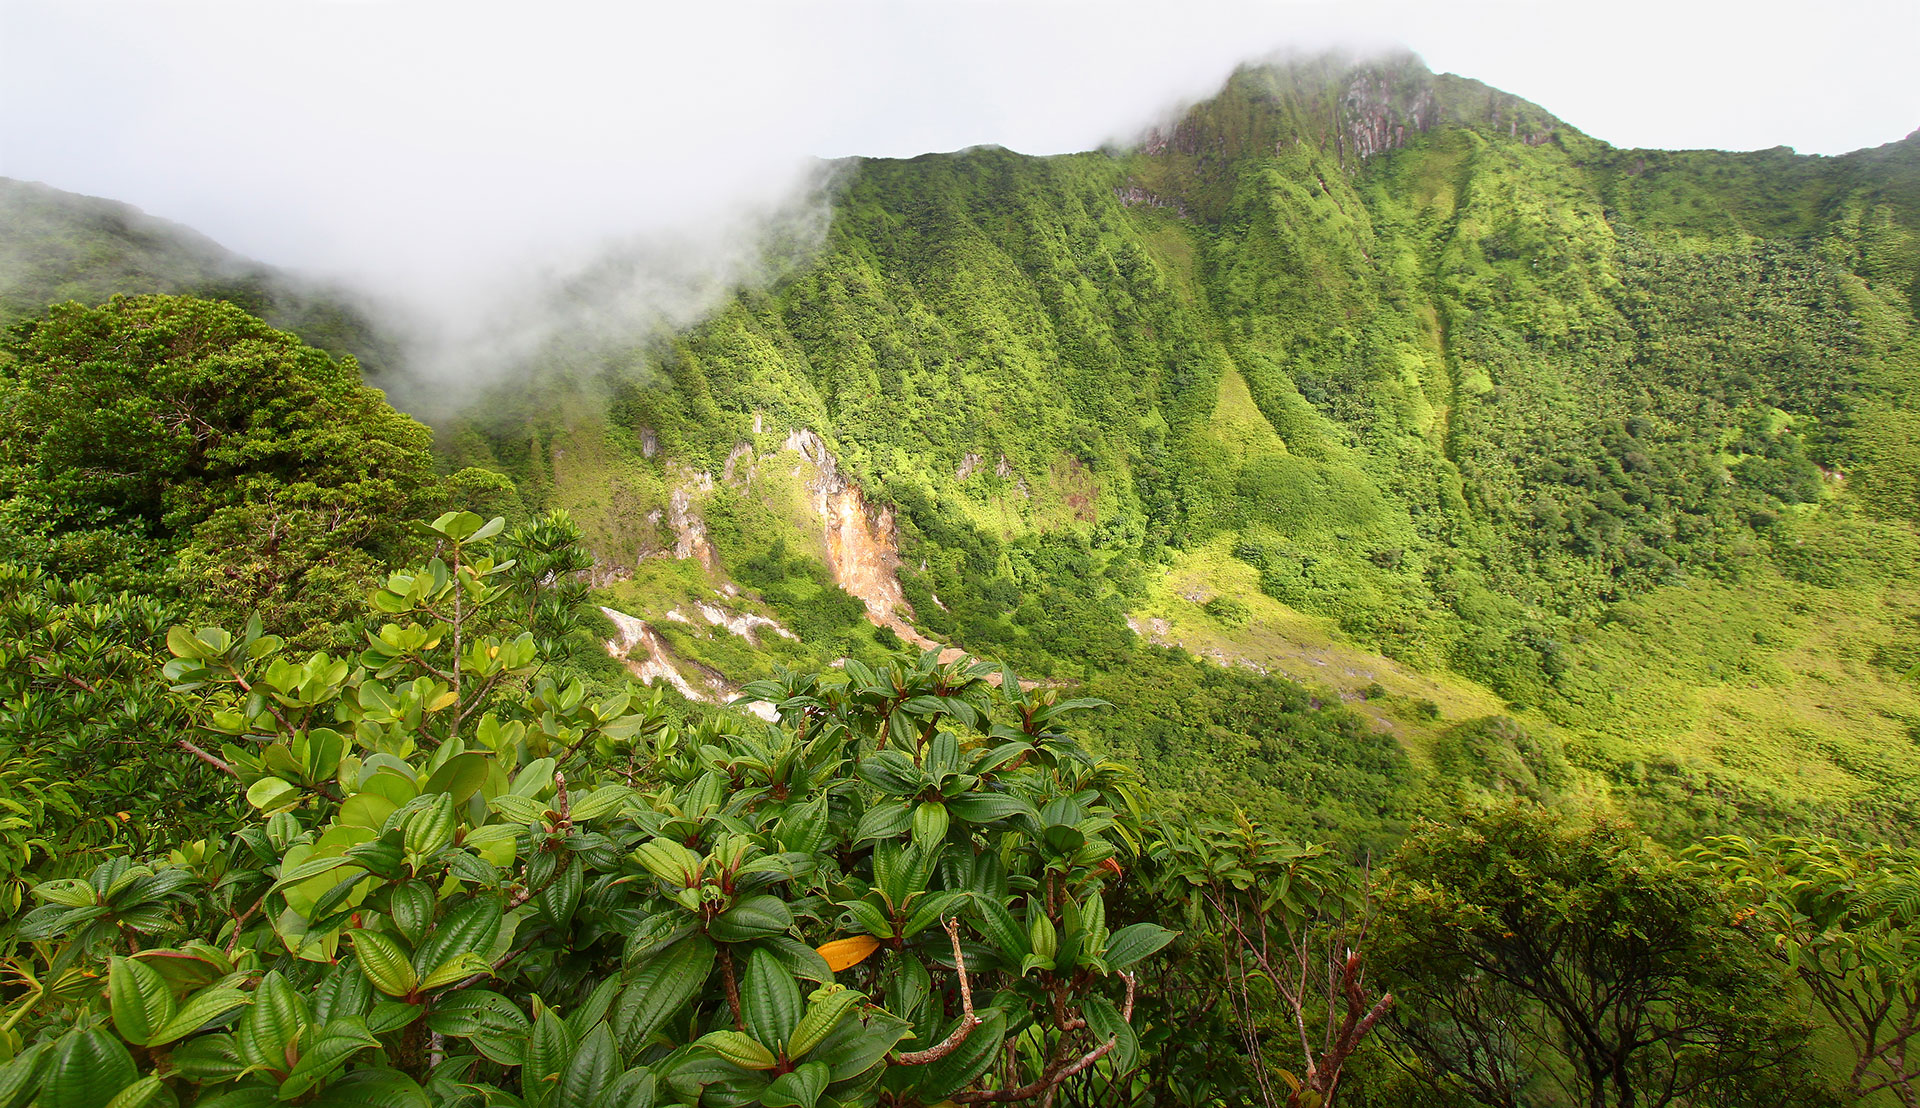 Mount Liamuiga; Courtesy of Jason Patrick Ross/Shutterstock.com